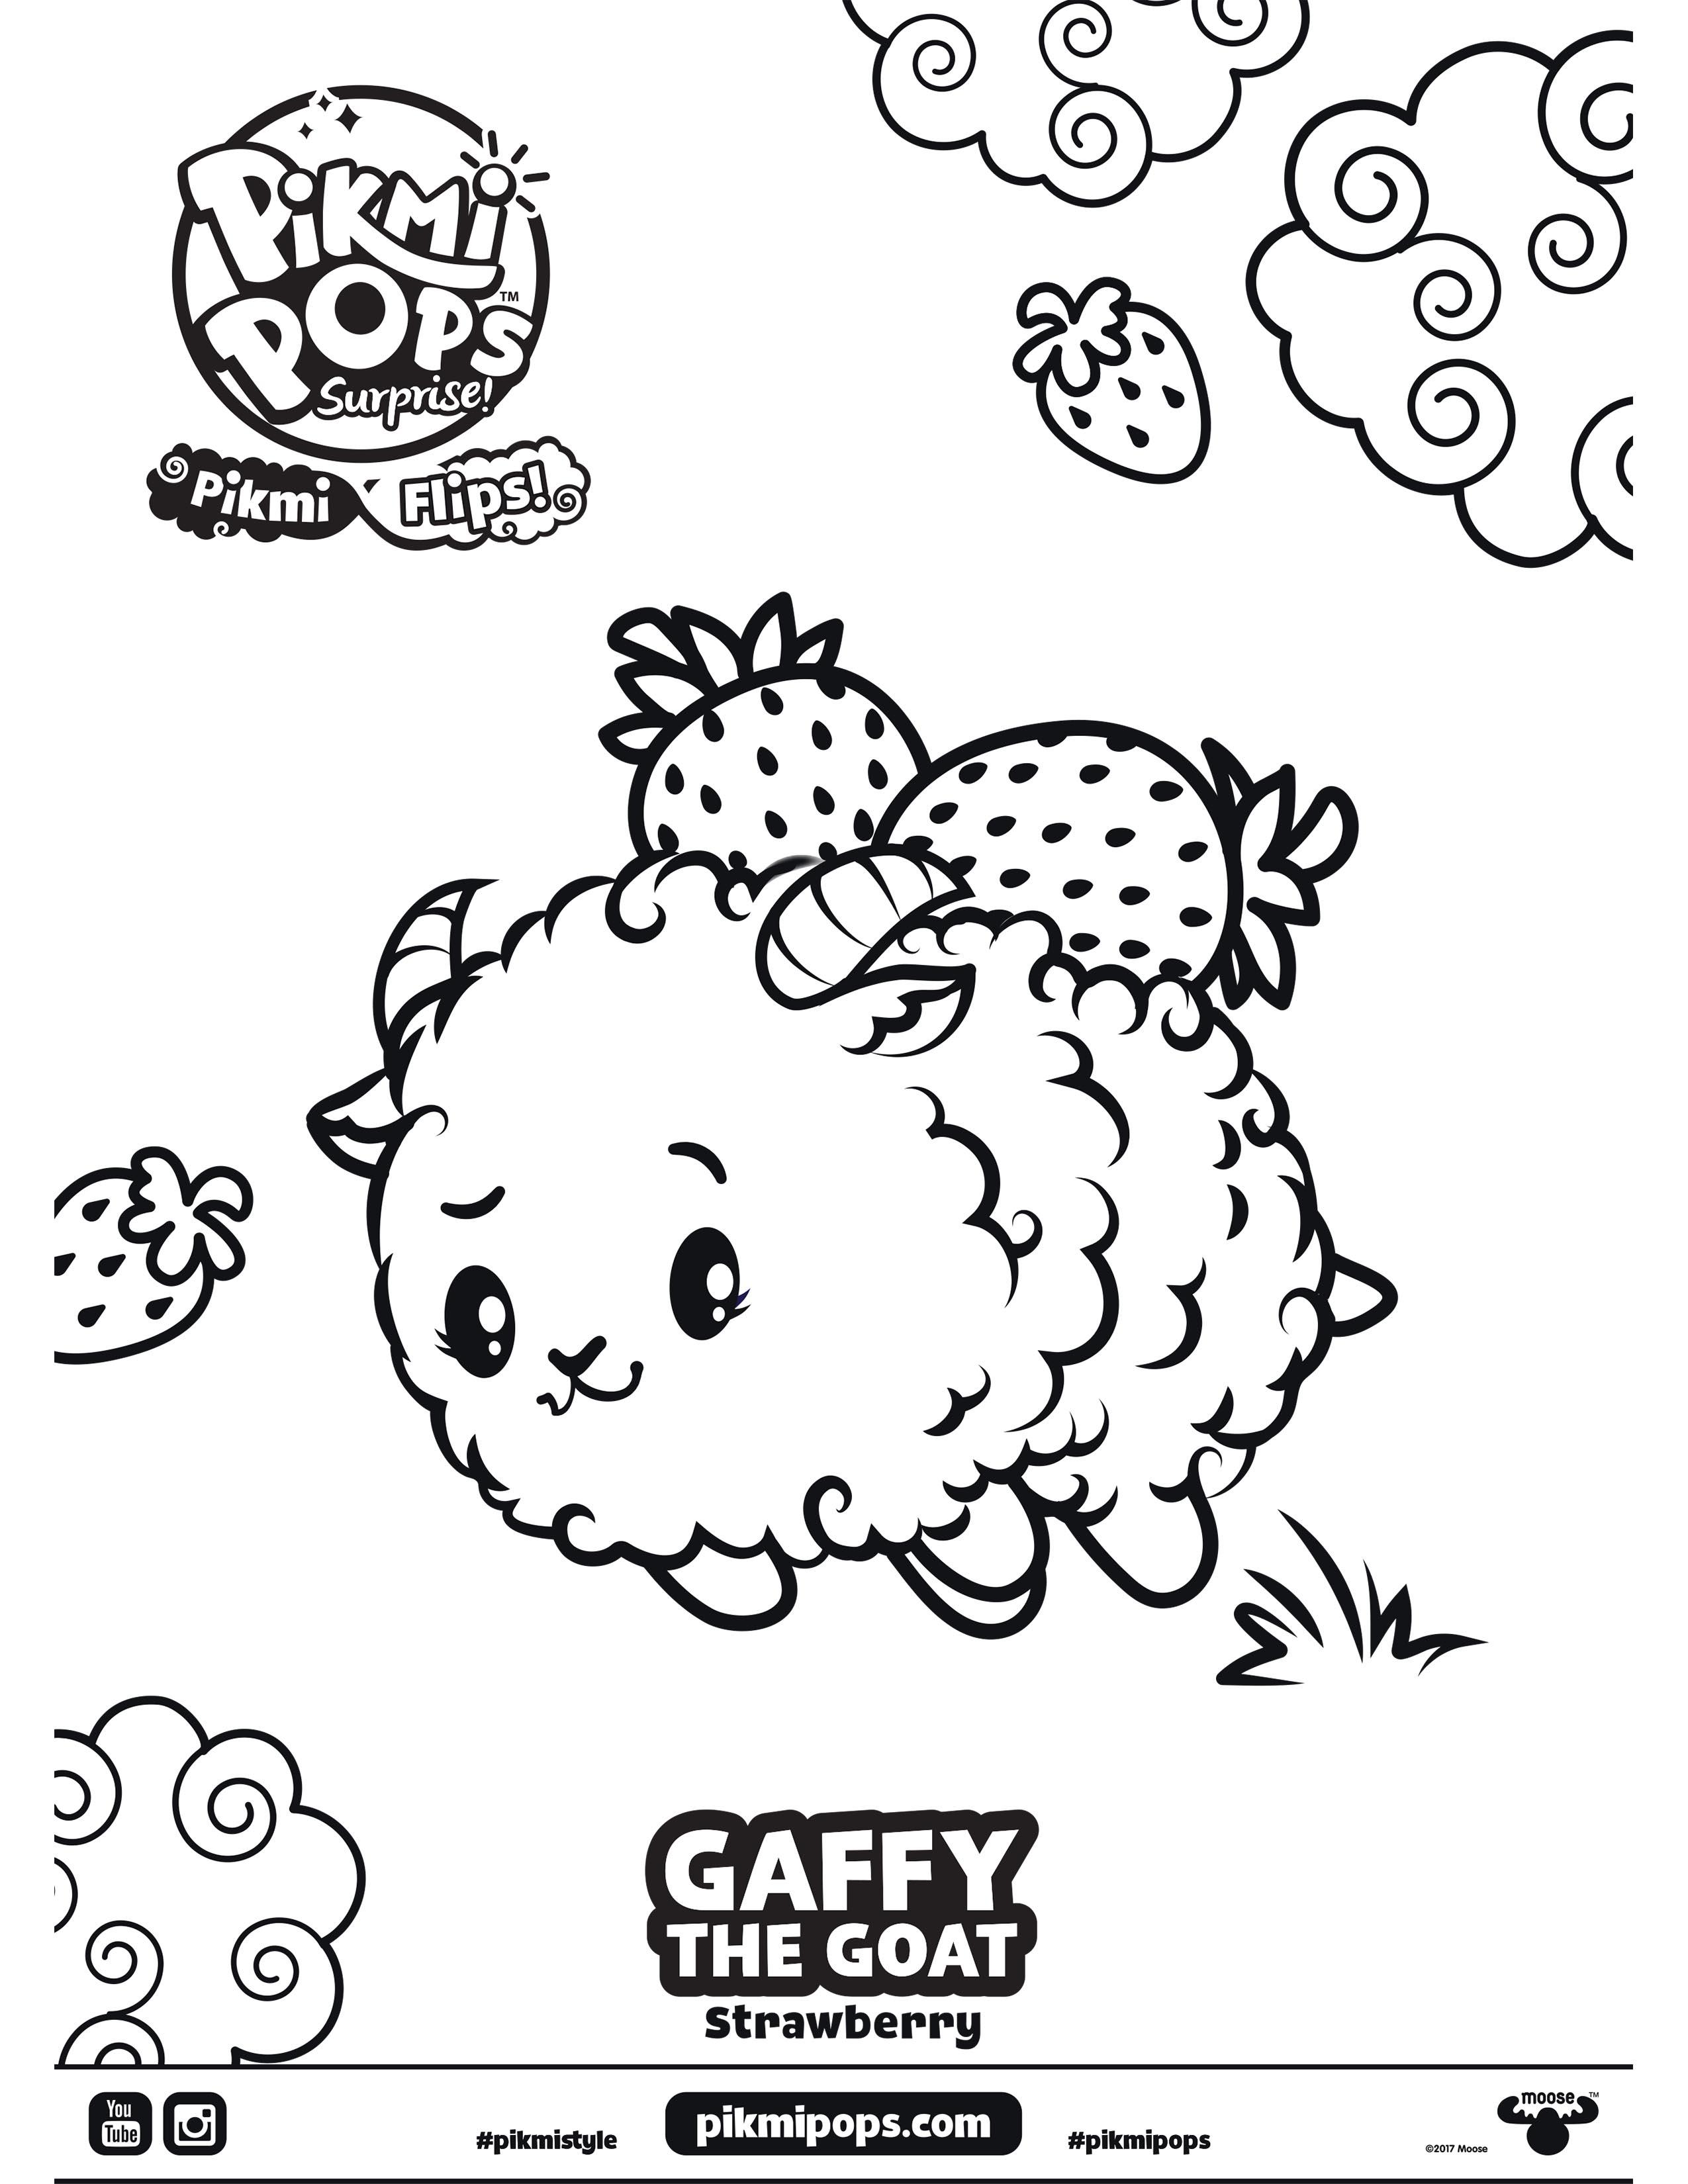 Pikmi Pops Surprise Season 4 Flips Coloring Sheet Gaffy The